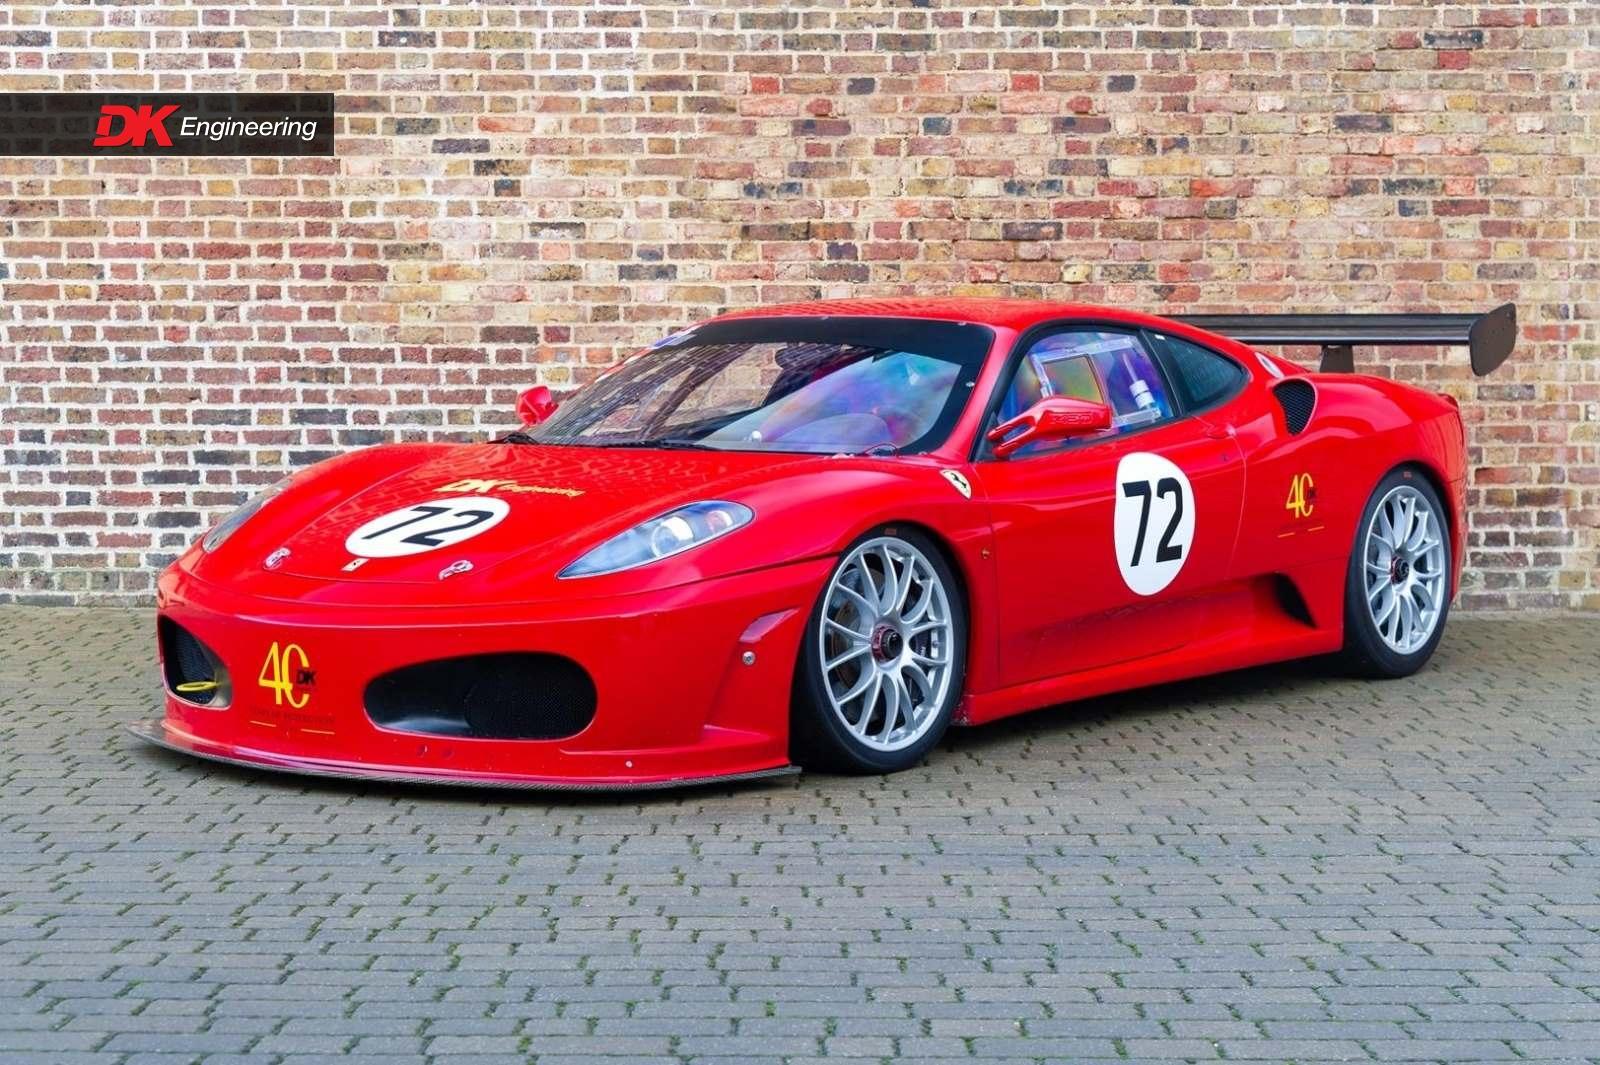 Ferrari 430 Challenge For Sale Vehicle Sales Dk Engineering